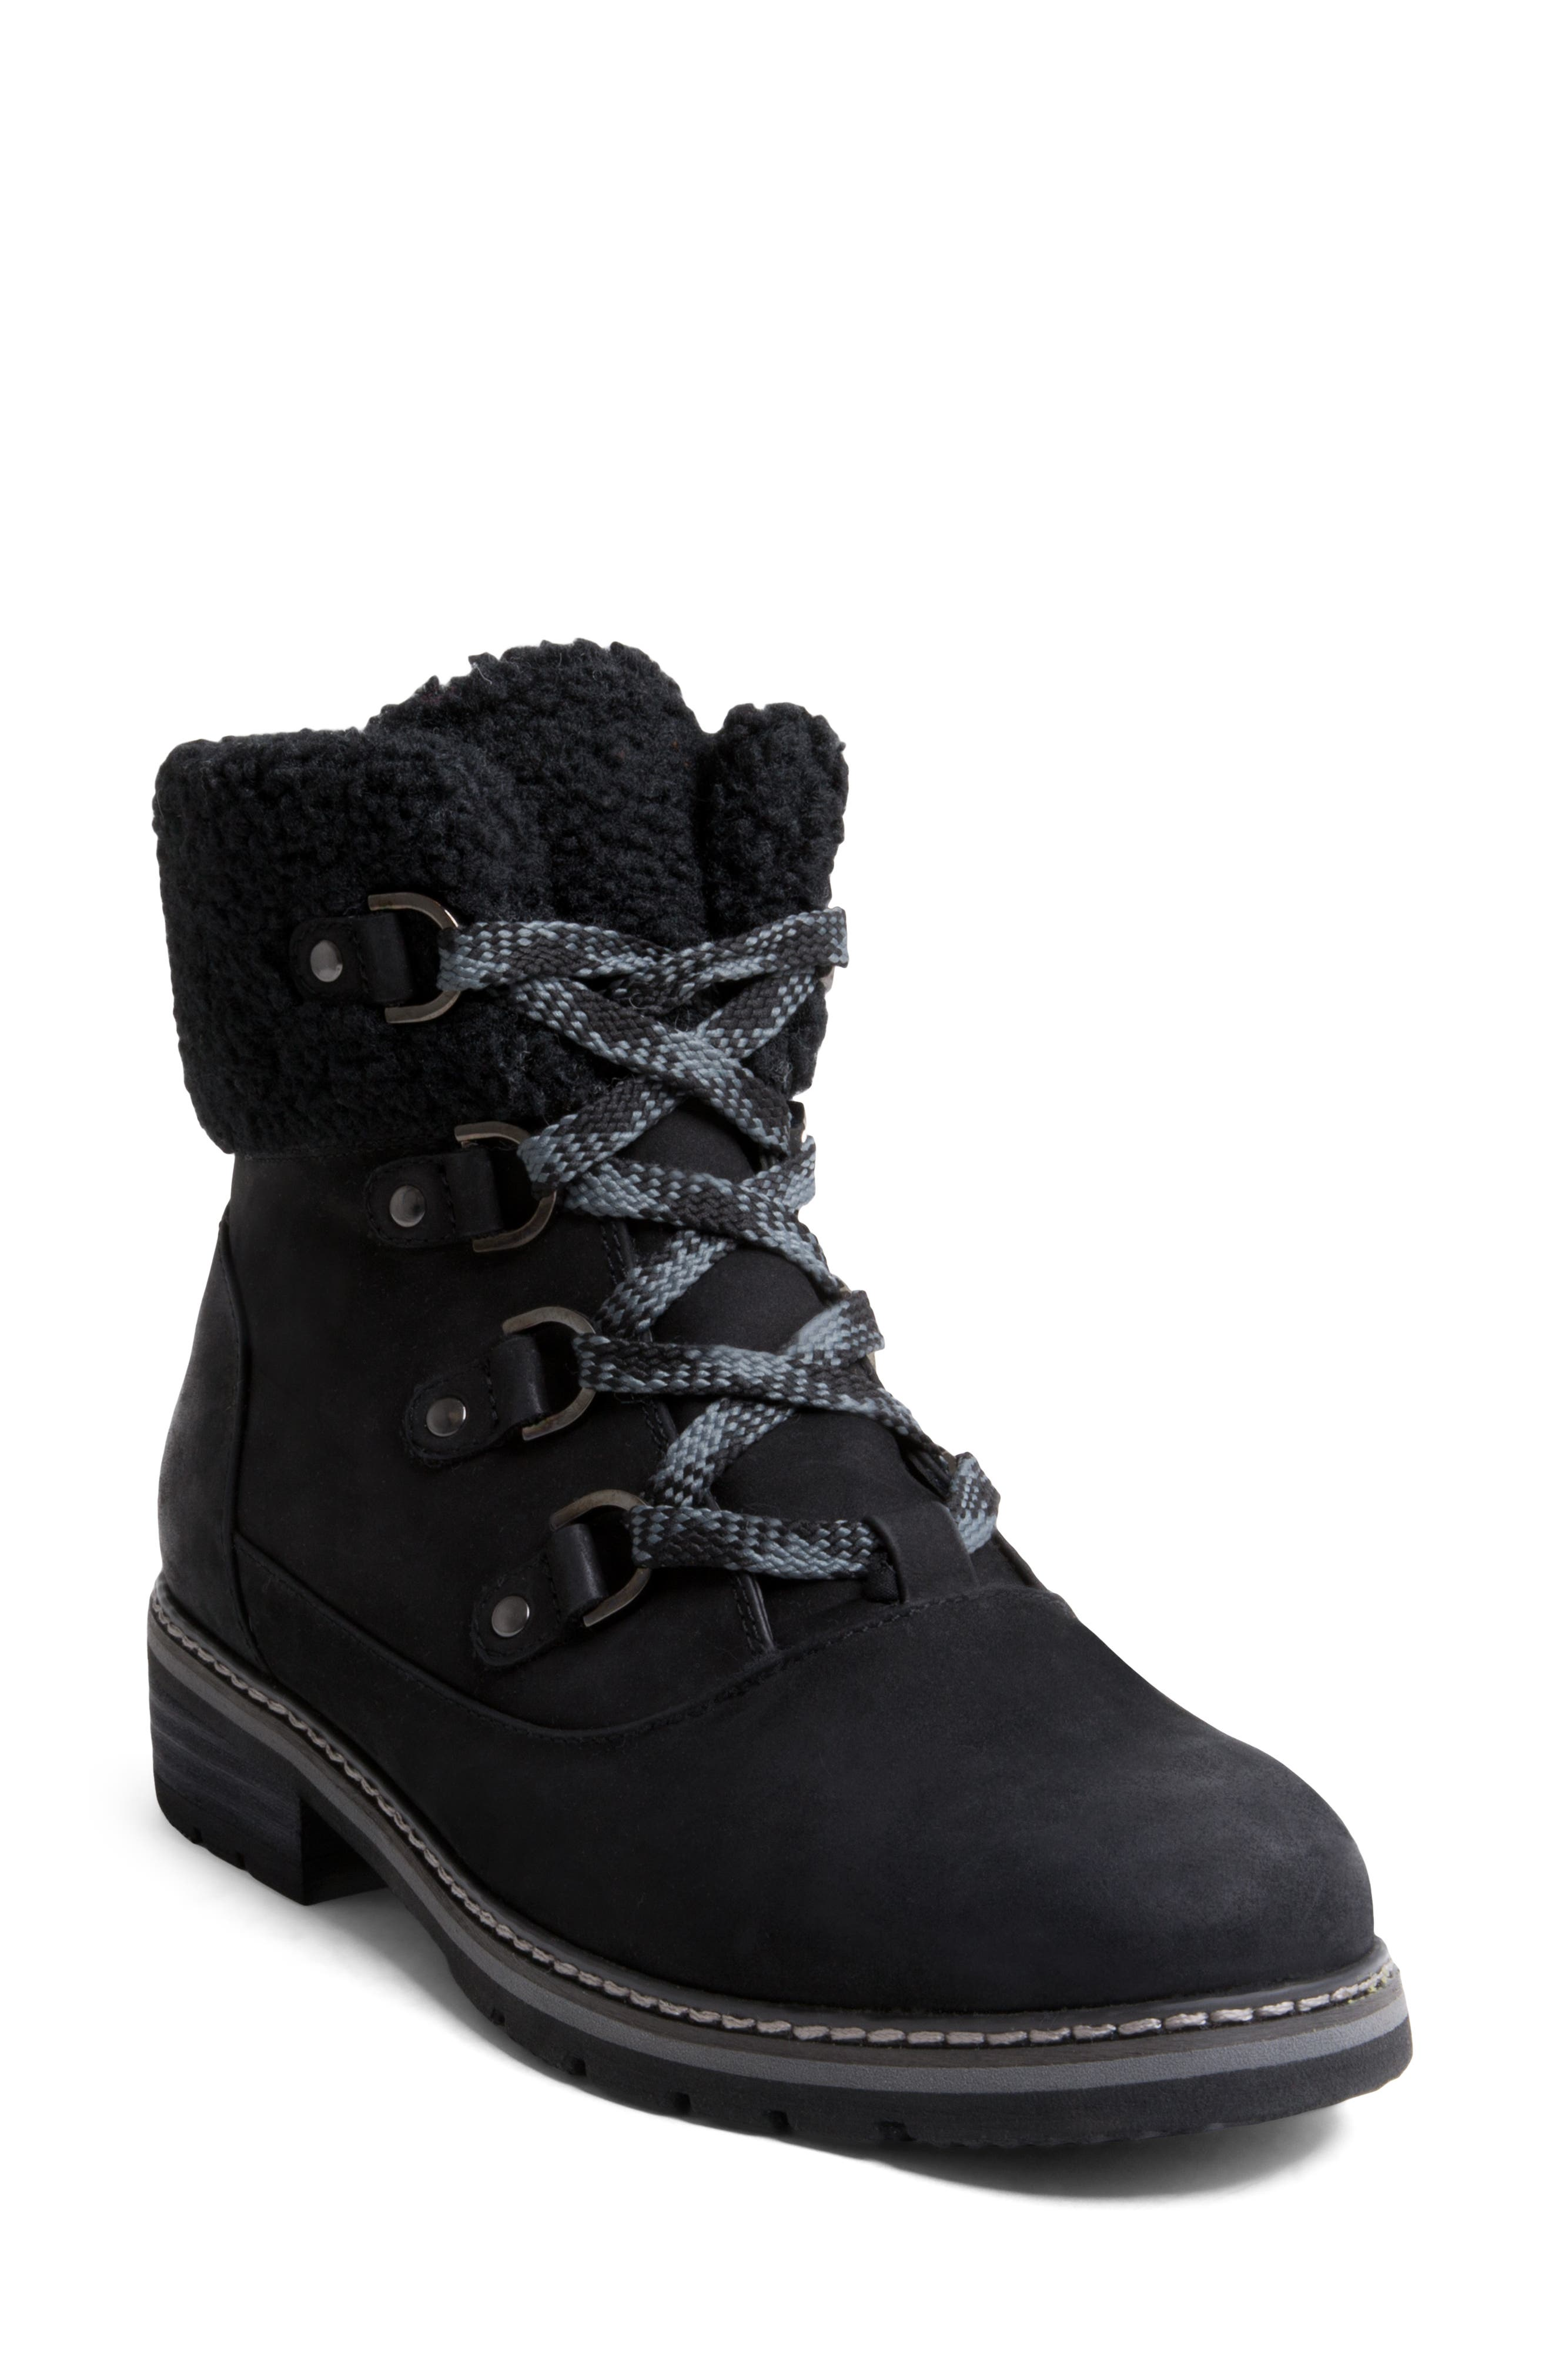 Vanessa Waterproof Boot,                         Main,                         color, BLACK NUBUCK LEATHER